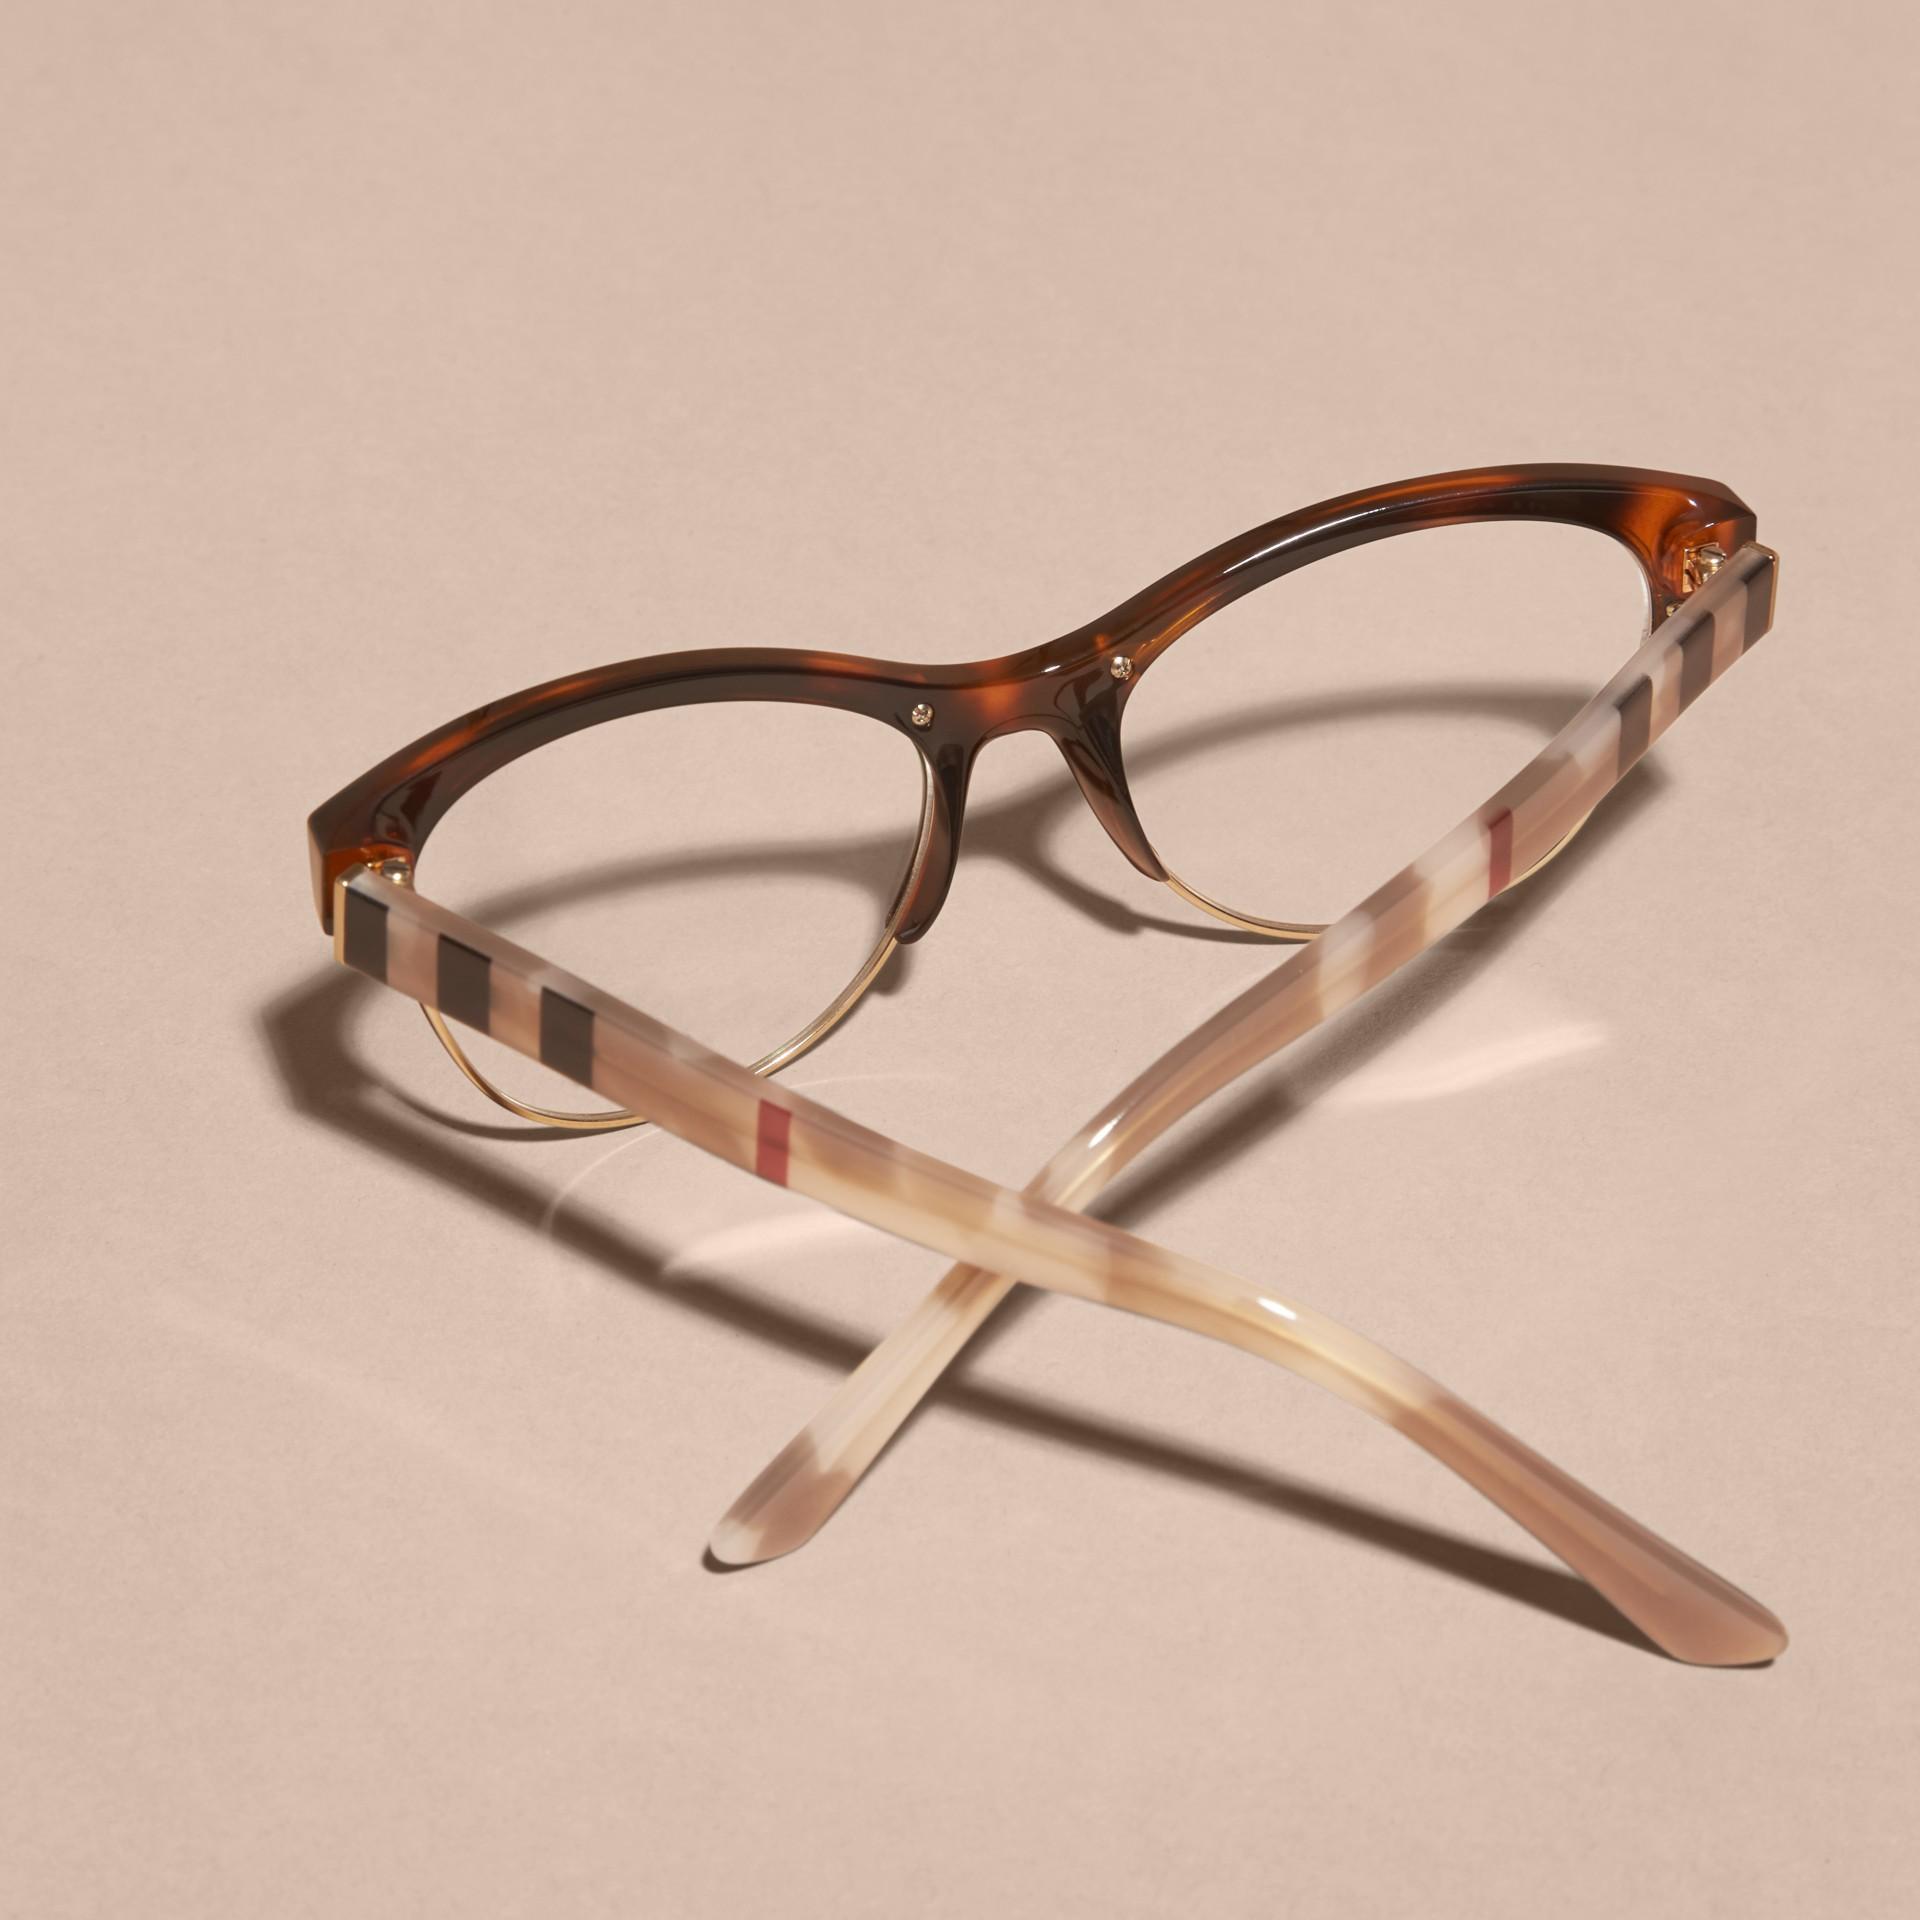 Burberry Half Frame Glasses : Half-rimmed Cat-eye Optical Frames Light Russet Brown ...